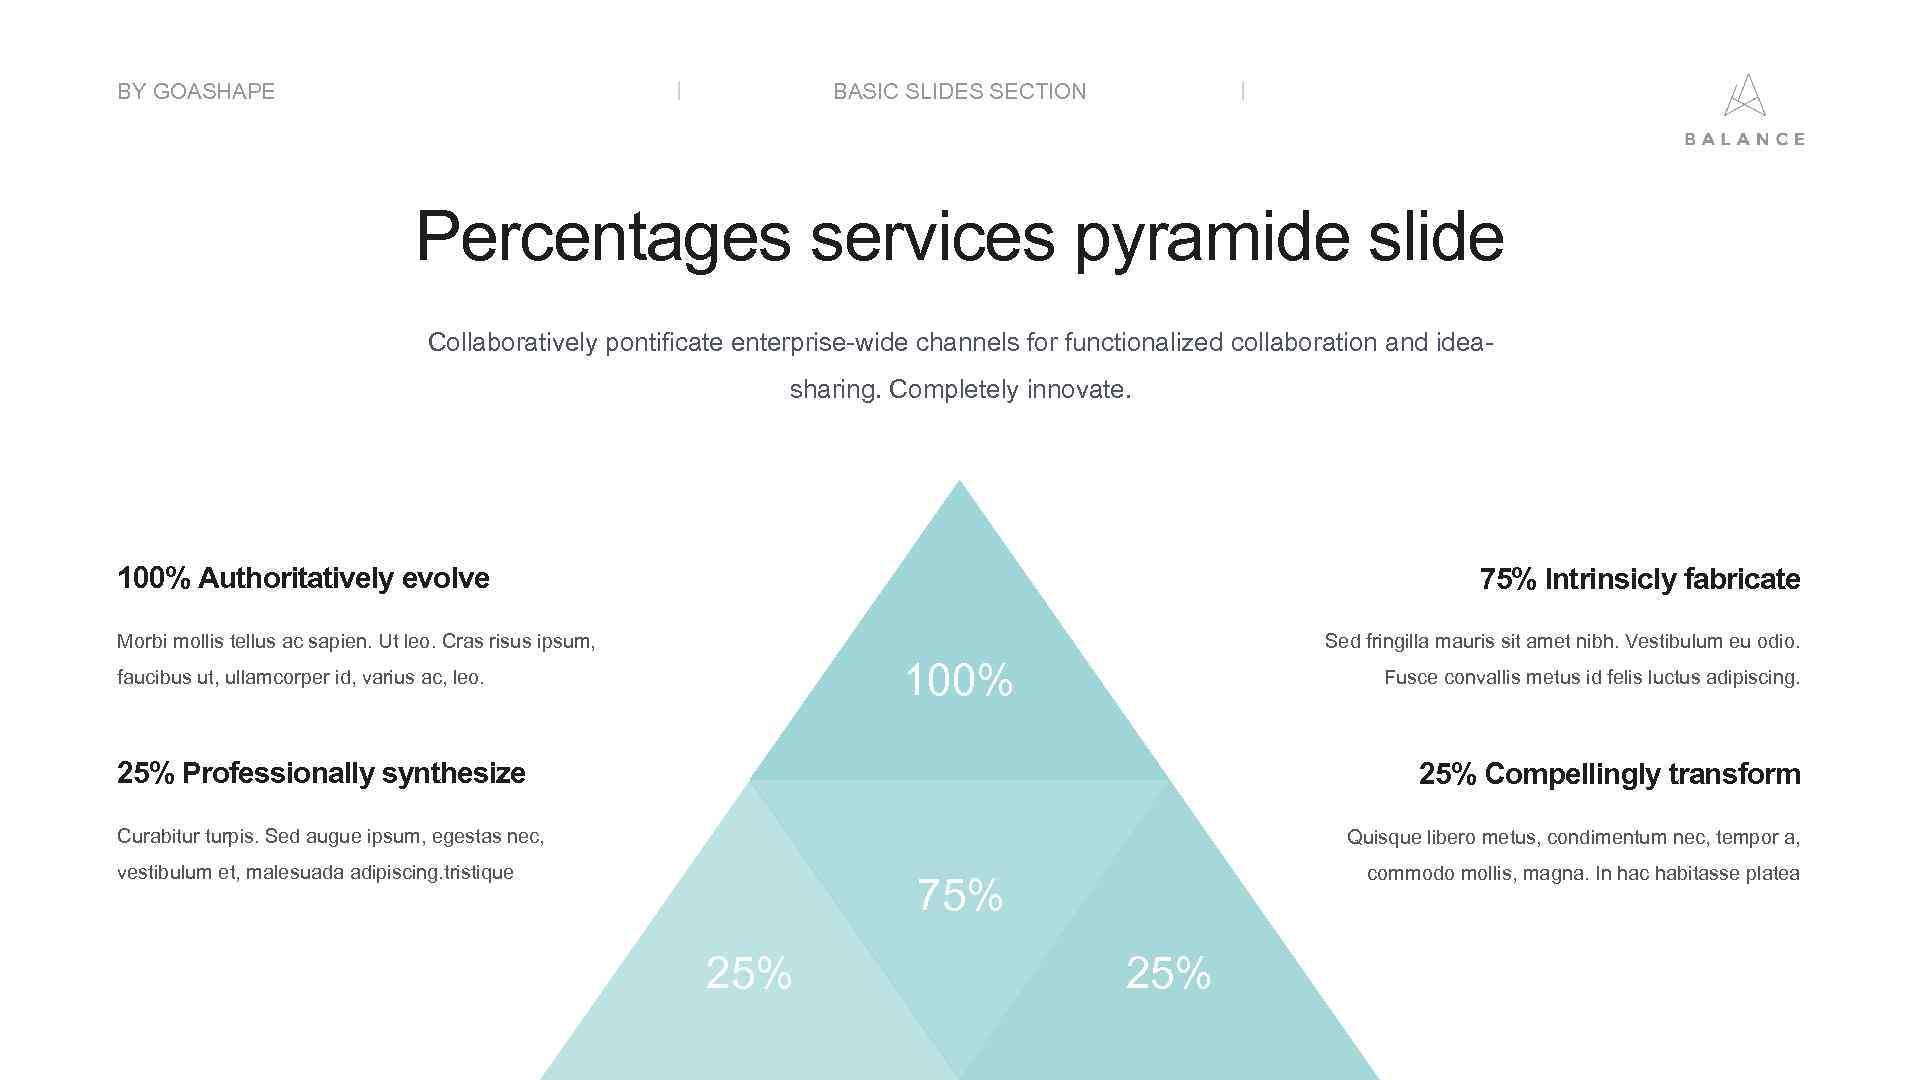 BY GOASHAPE BASIC SLIDES SECTION Percentages services pyramide slide Collaboratively pontificate enterprise-wide channels for